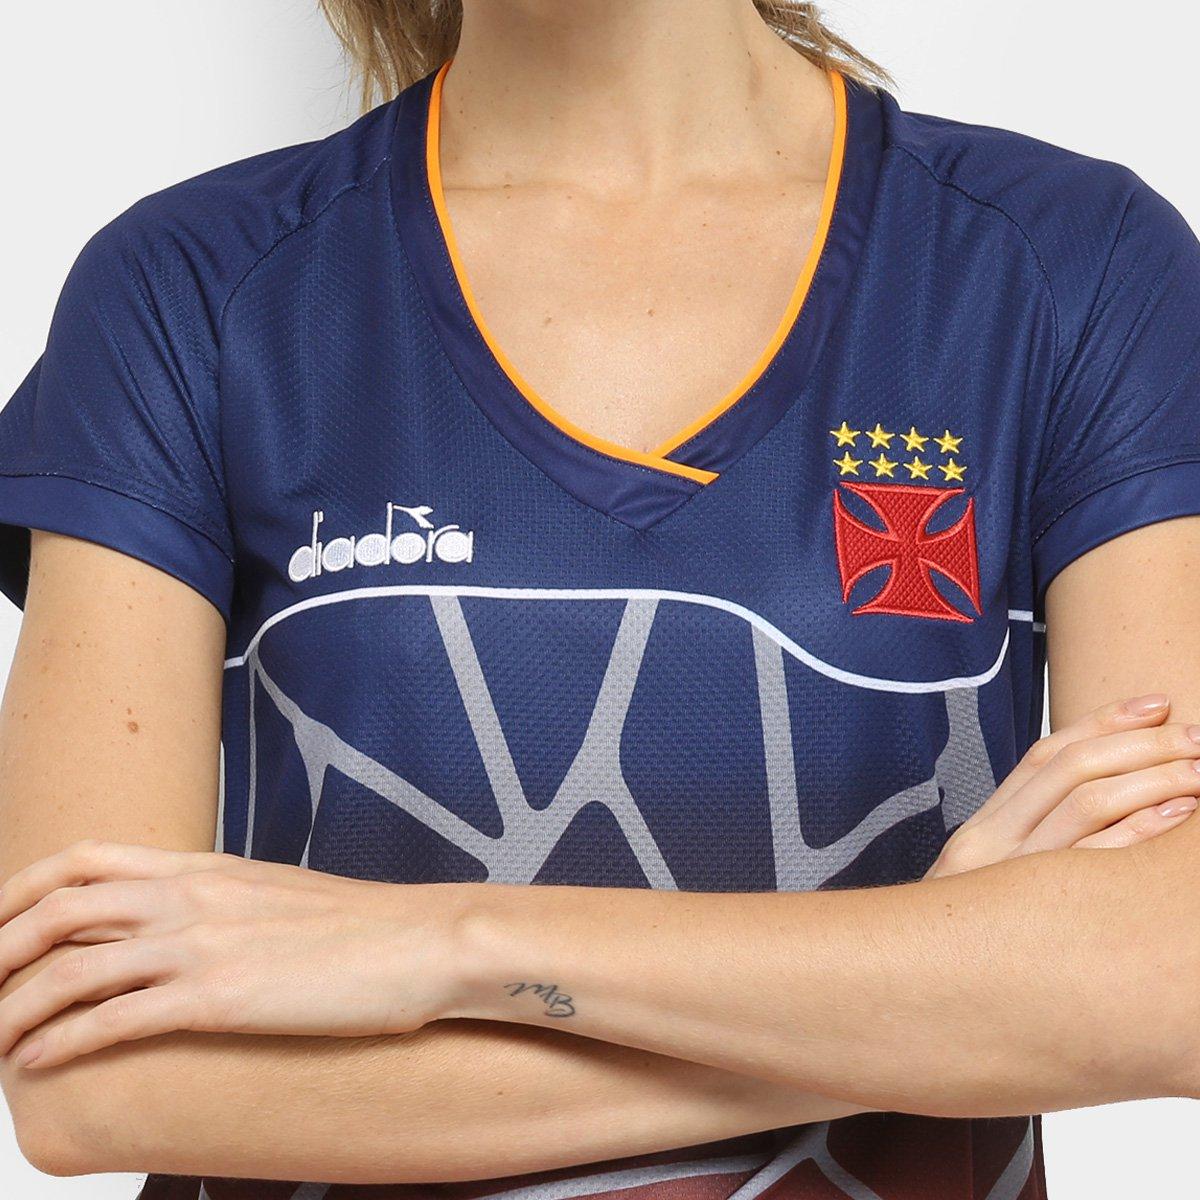 Vasco 2018 Diadora Feminina Marinho Treino Treino Vasco 2018 Atleta Camisa Camisa BT4xcqA